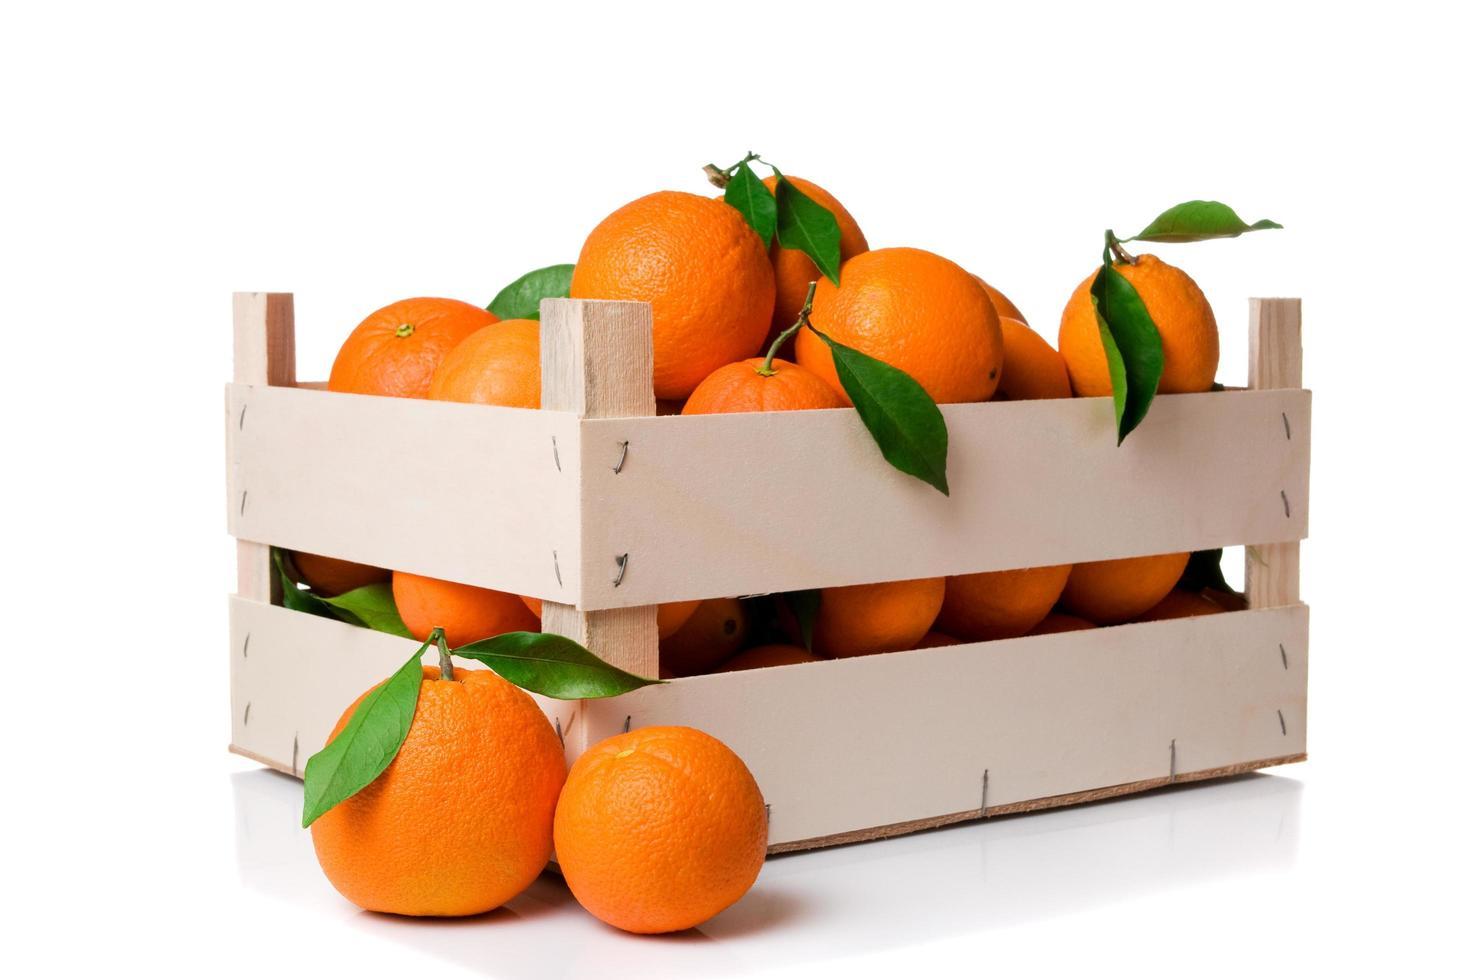 apelsiner låda isolatd foto